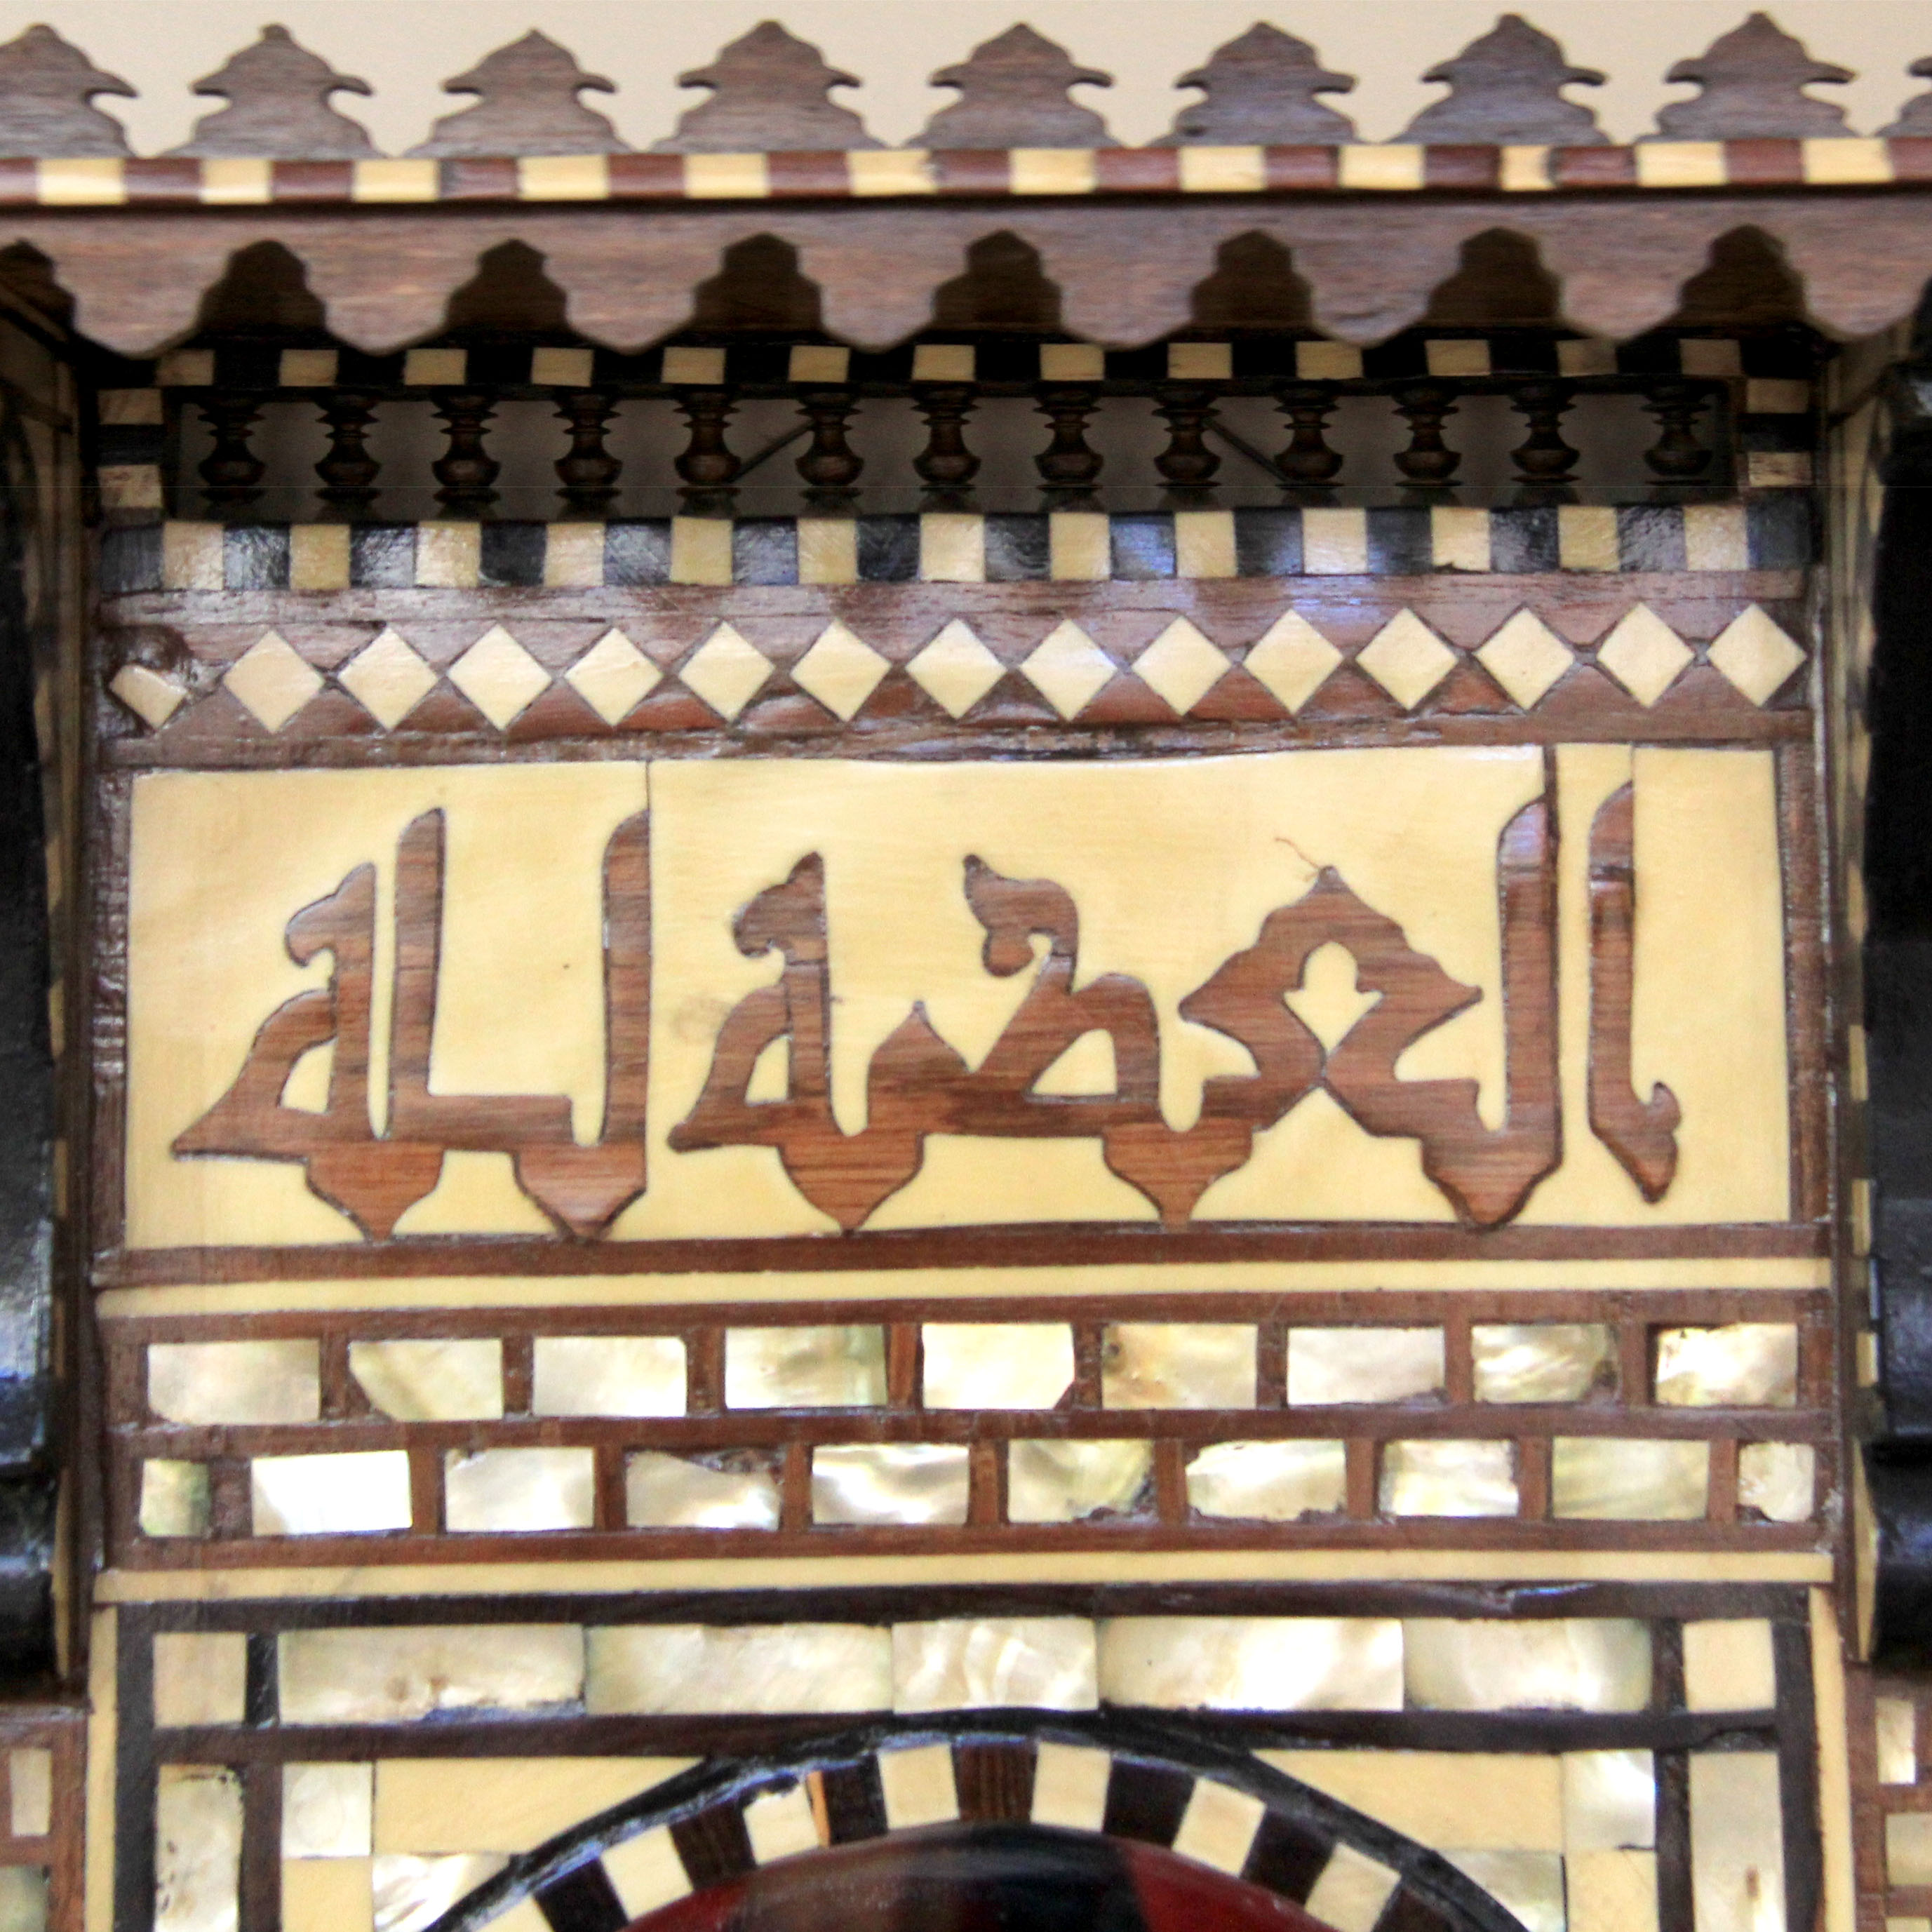 arabicwriting